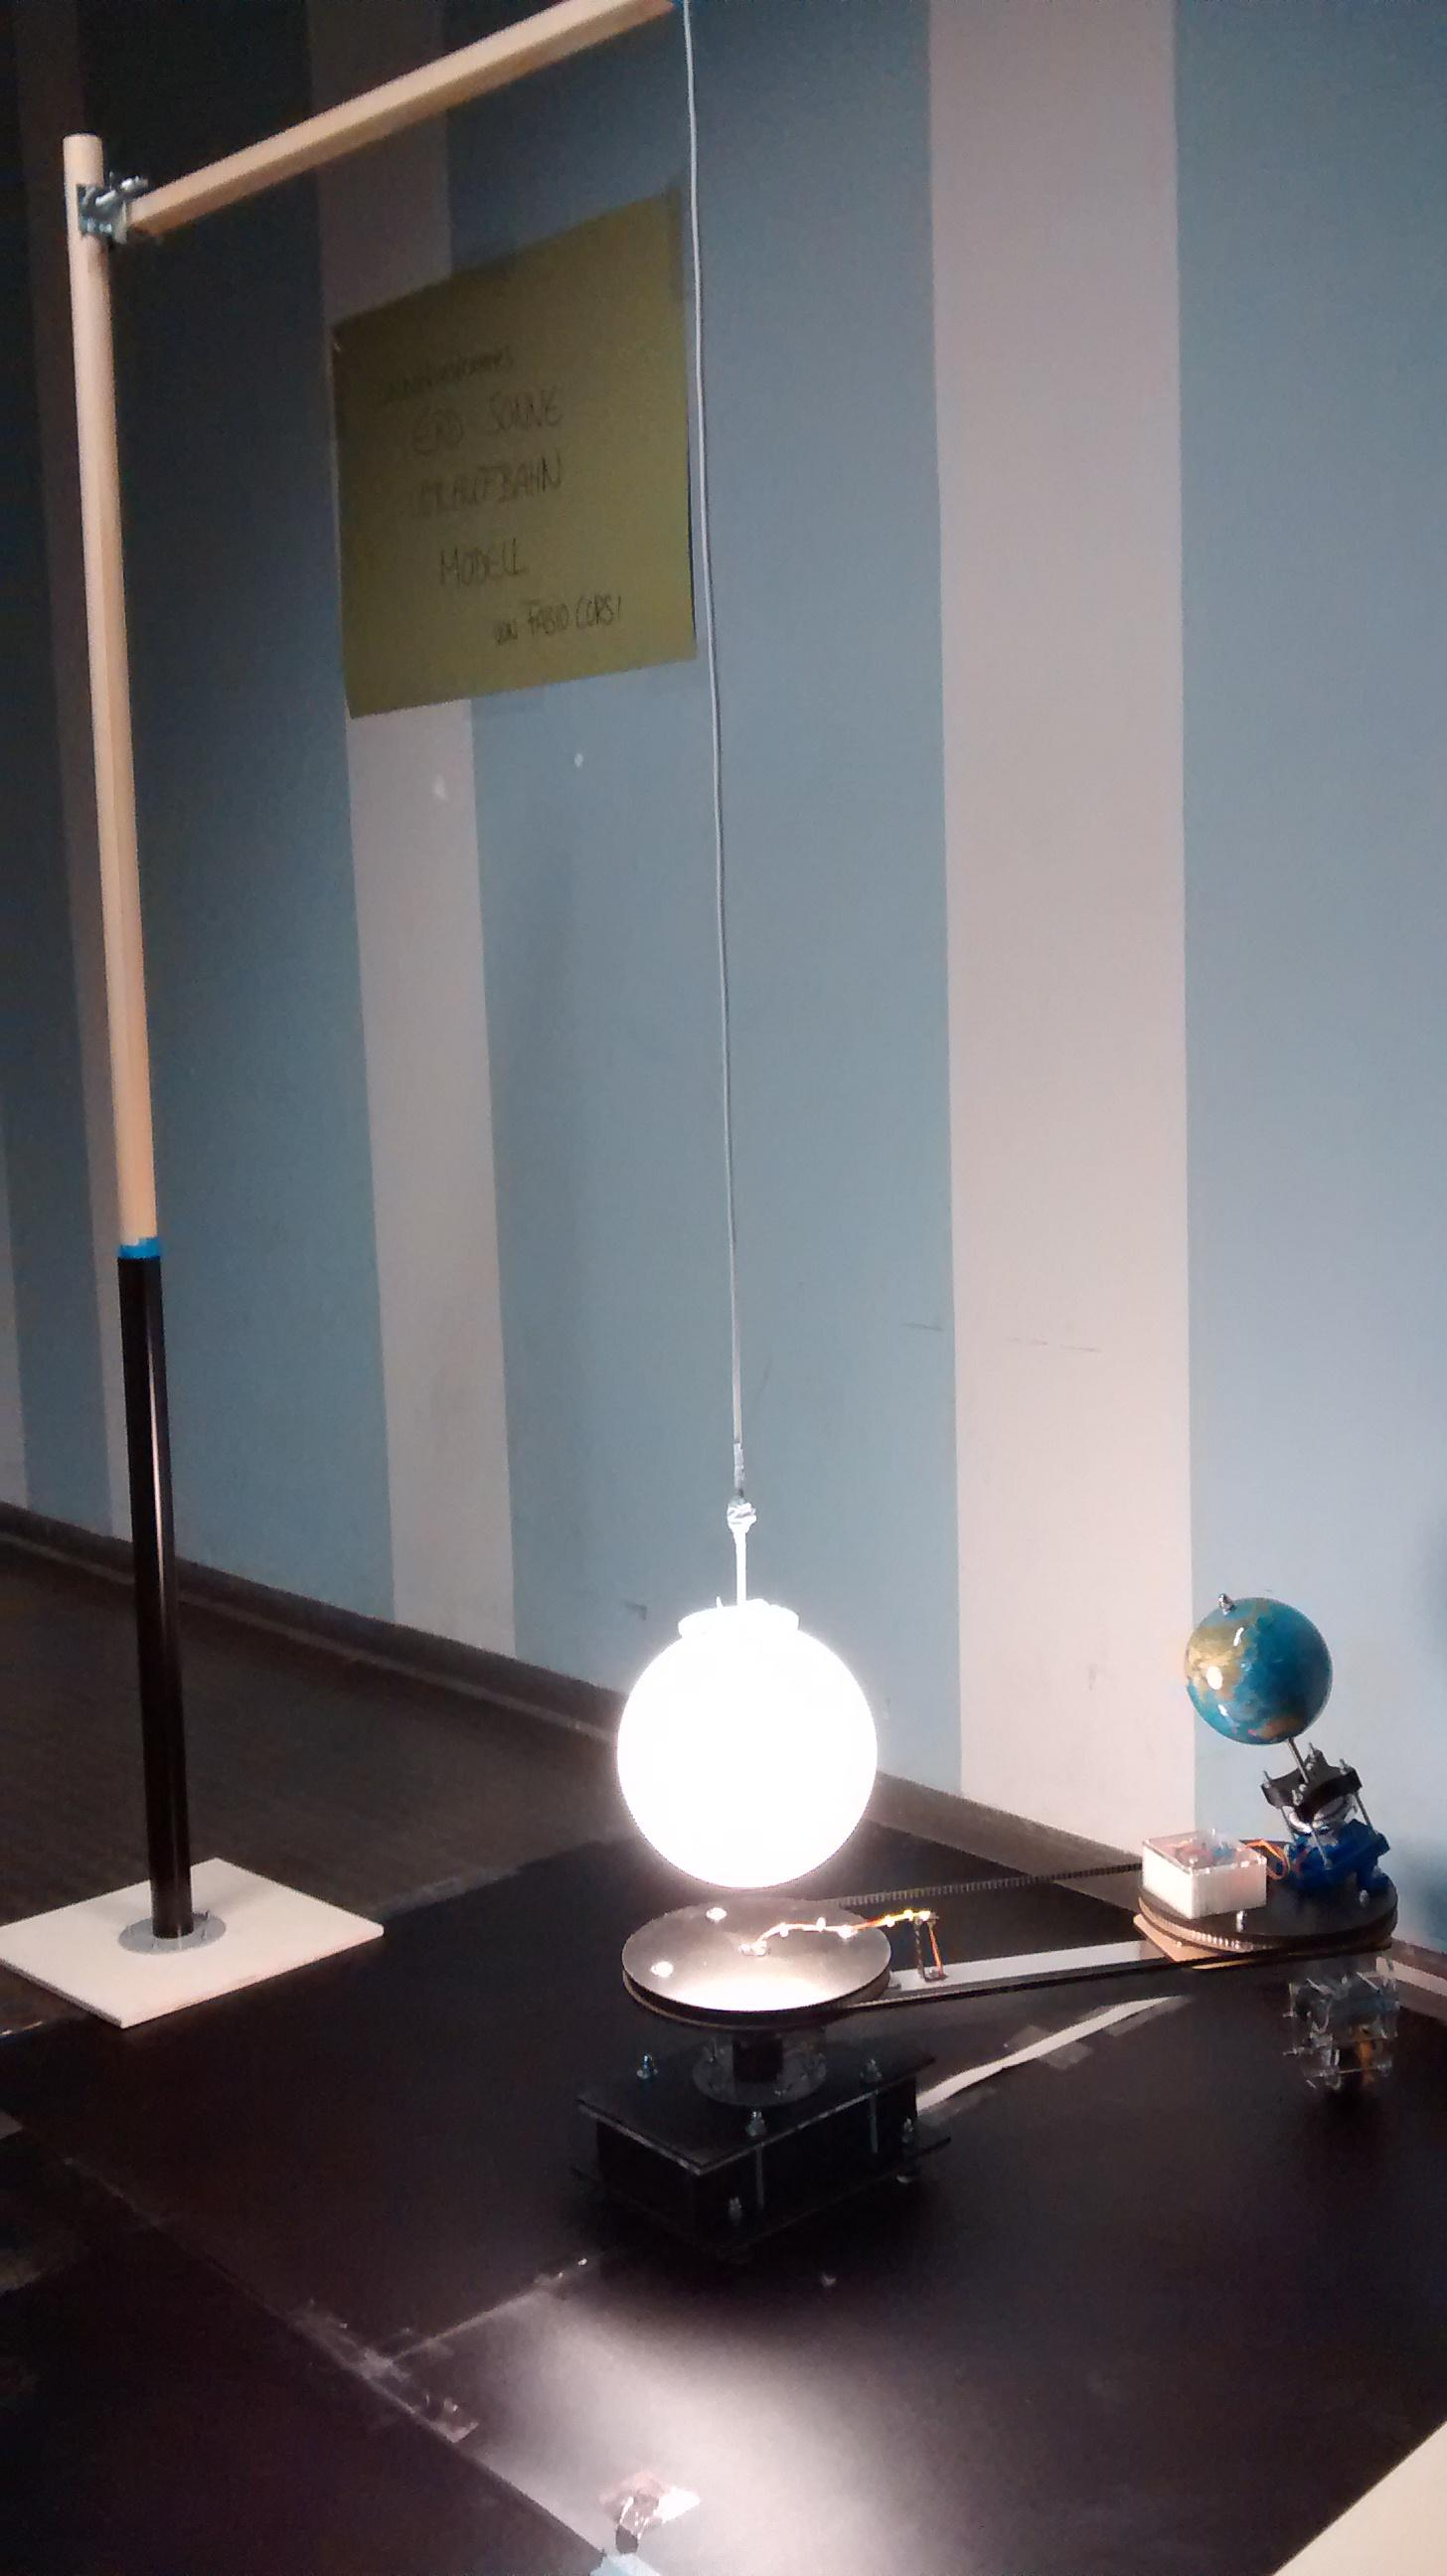 Galileino  - Hardware simulator of Earth and Sun in motion